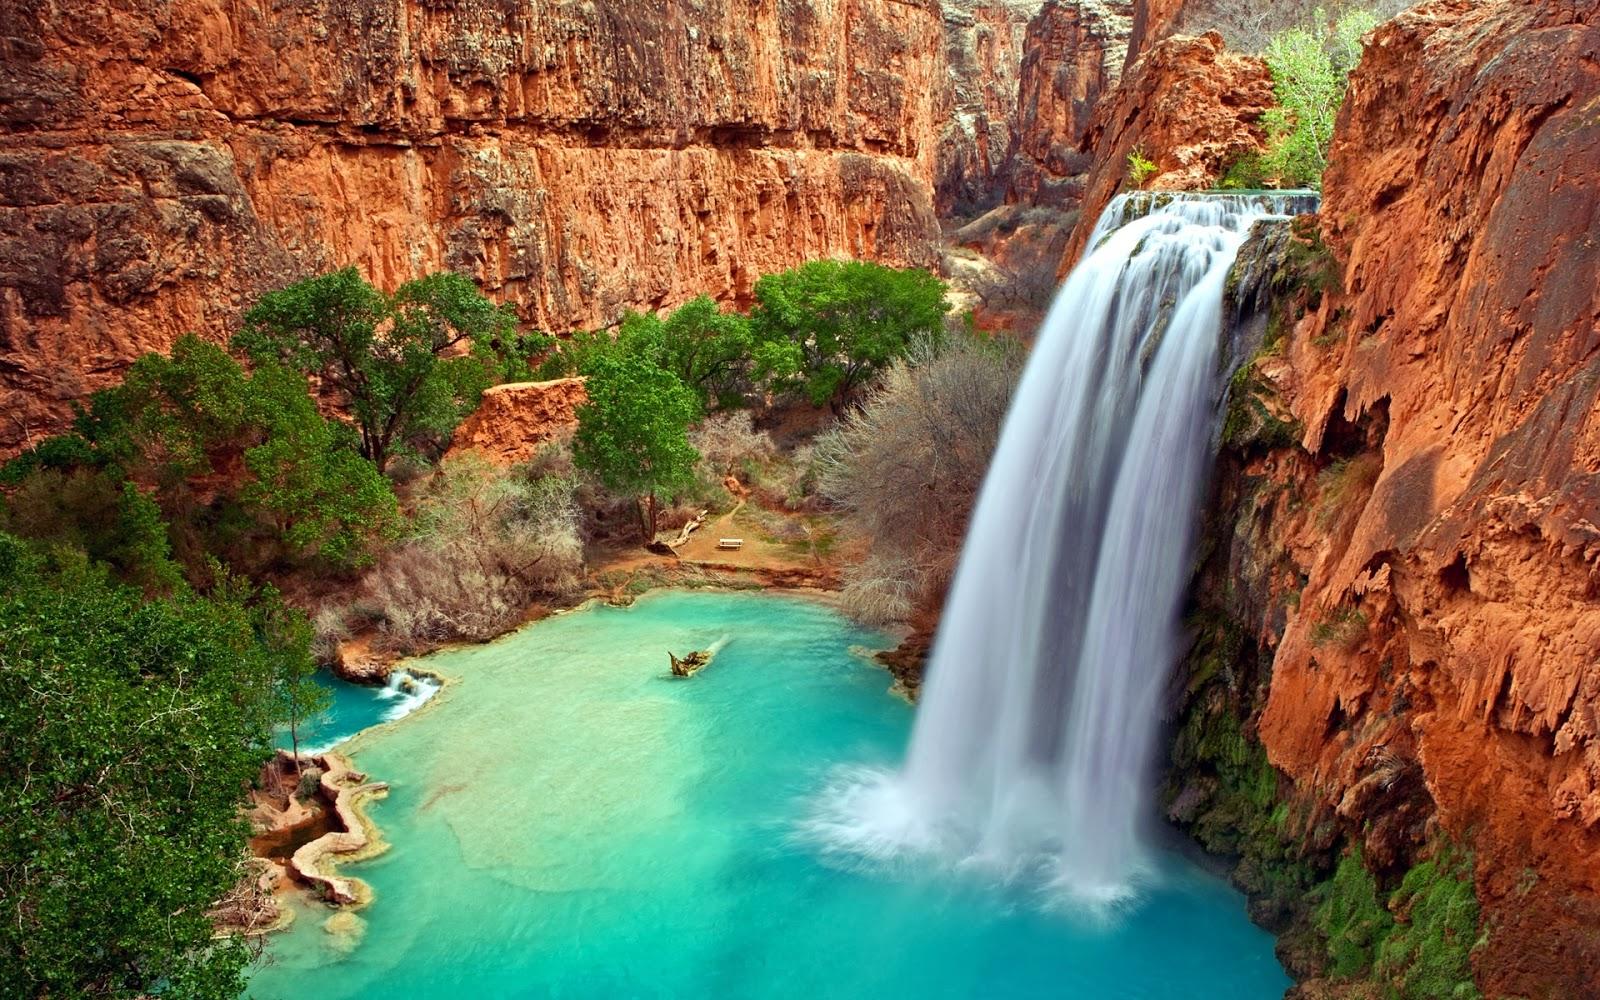 arizona waterfall hd images photos desktop wallpapers pics